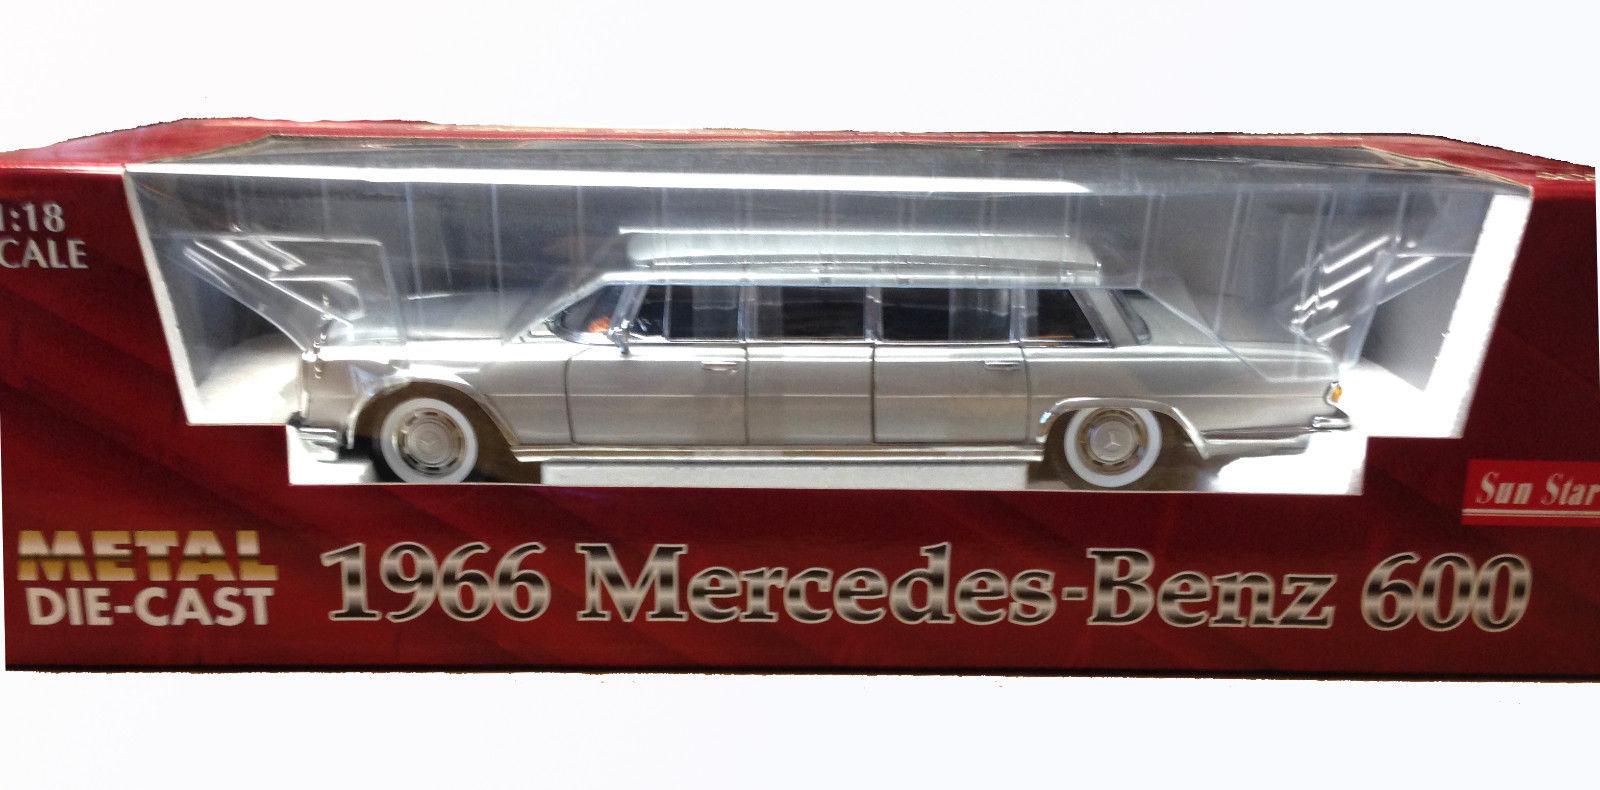 Sun Star silver 1966 Mercedes-Benz 600 DIECAST SCALE 1:18 #2201